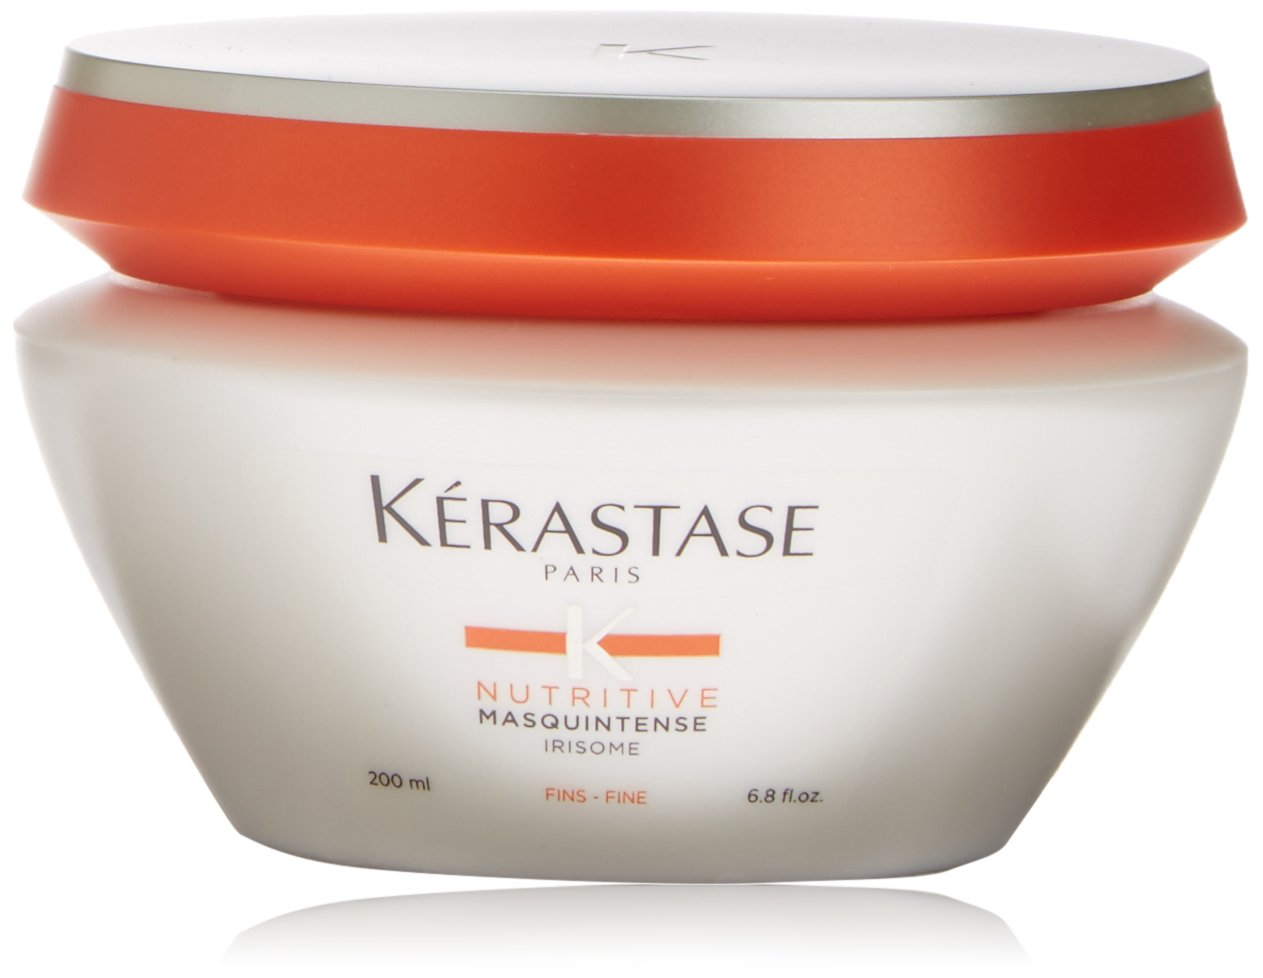 Kerastase, Mascarilla para el pelo - 200 ml. 3474636382705 55327_-200ml